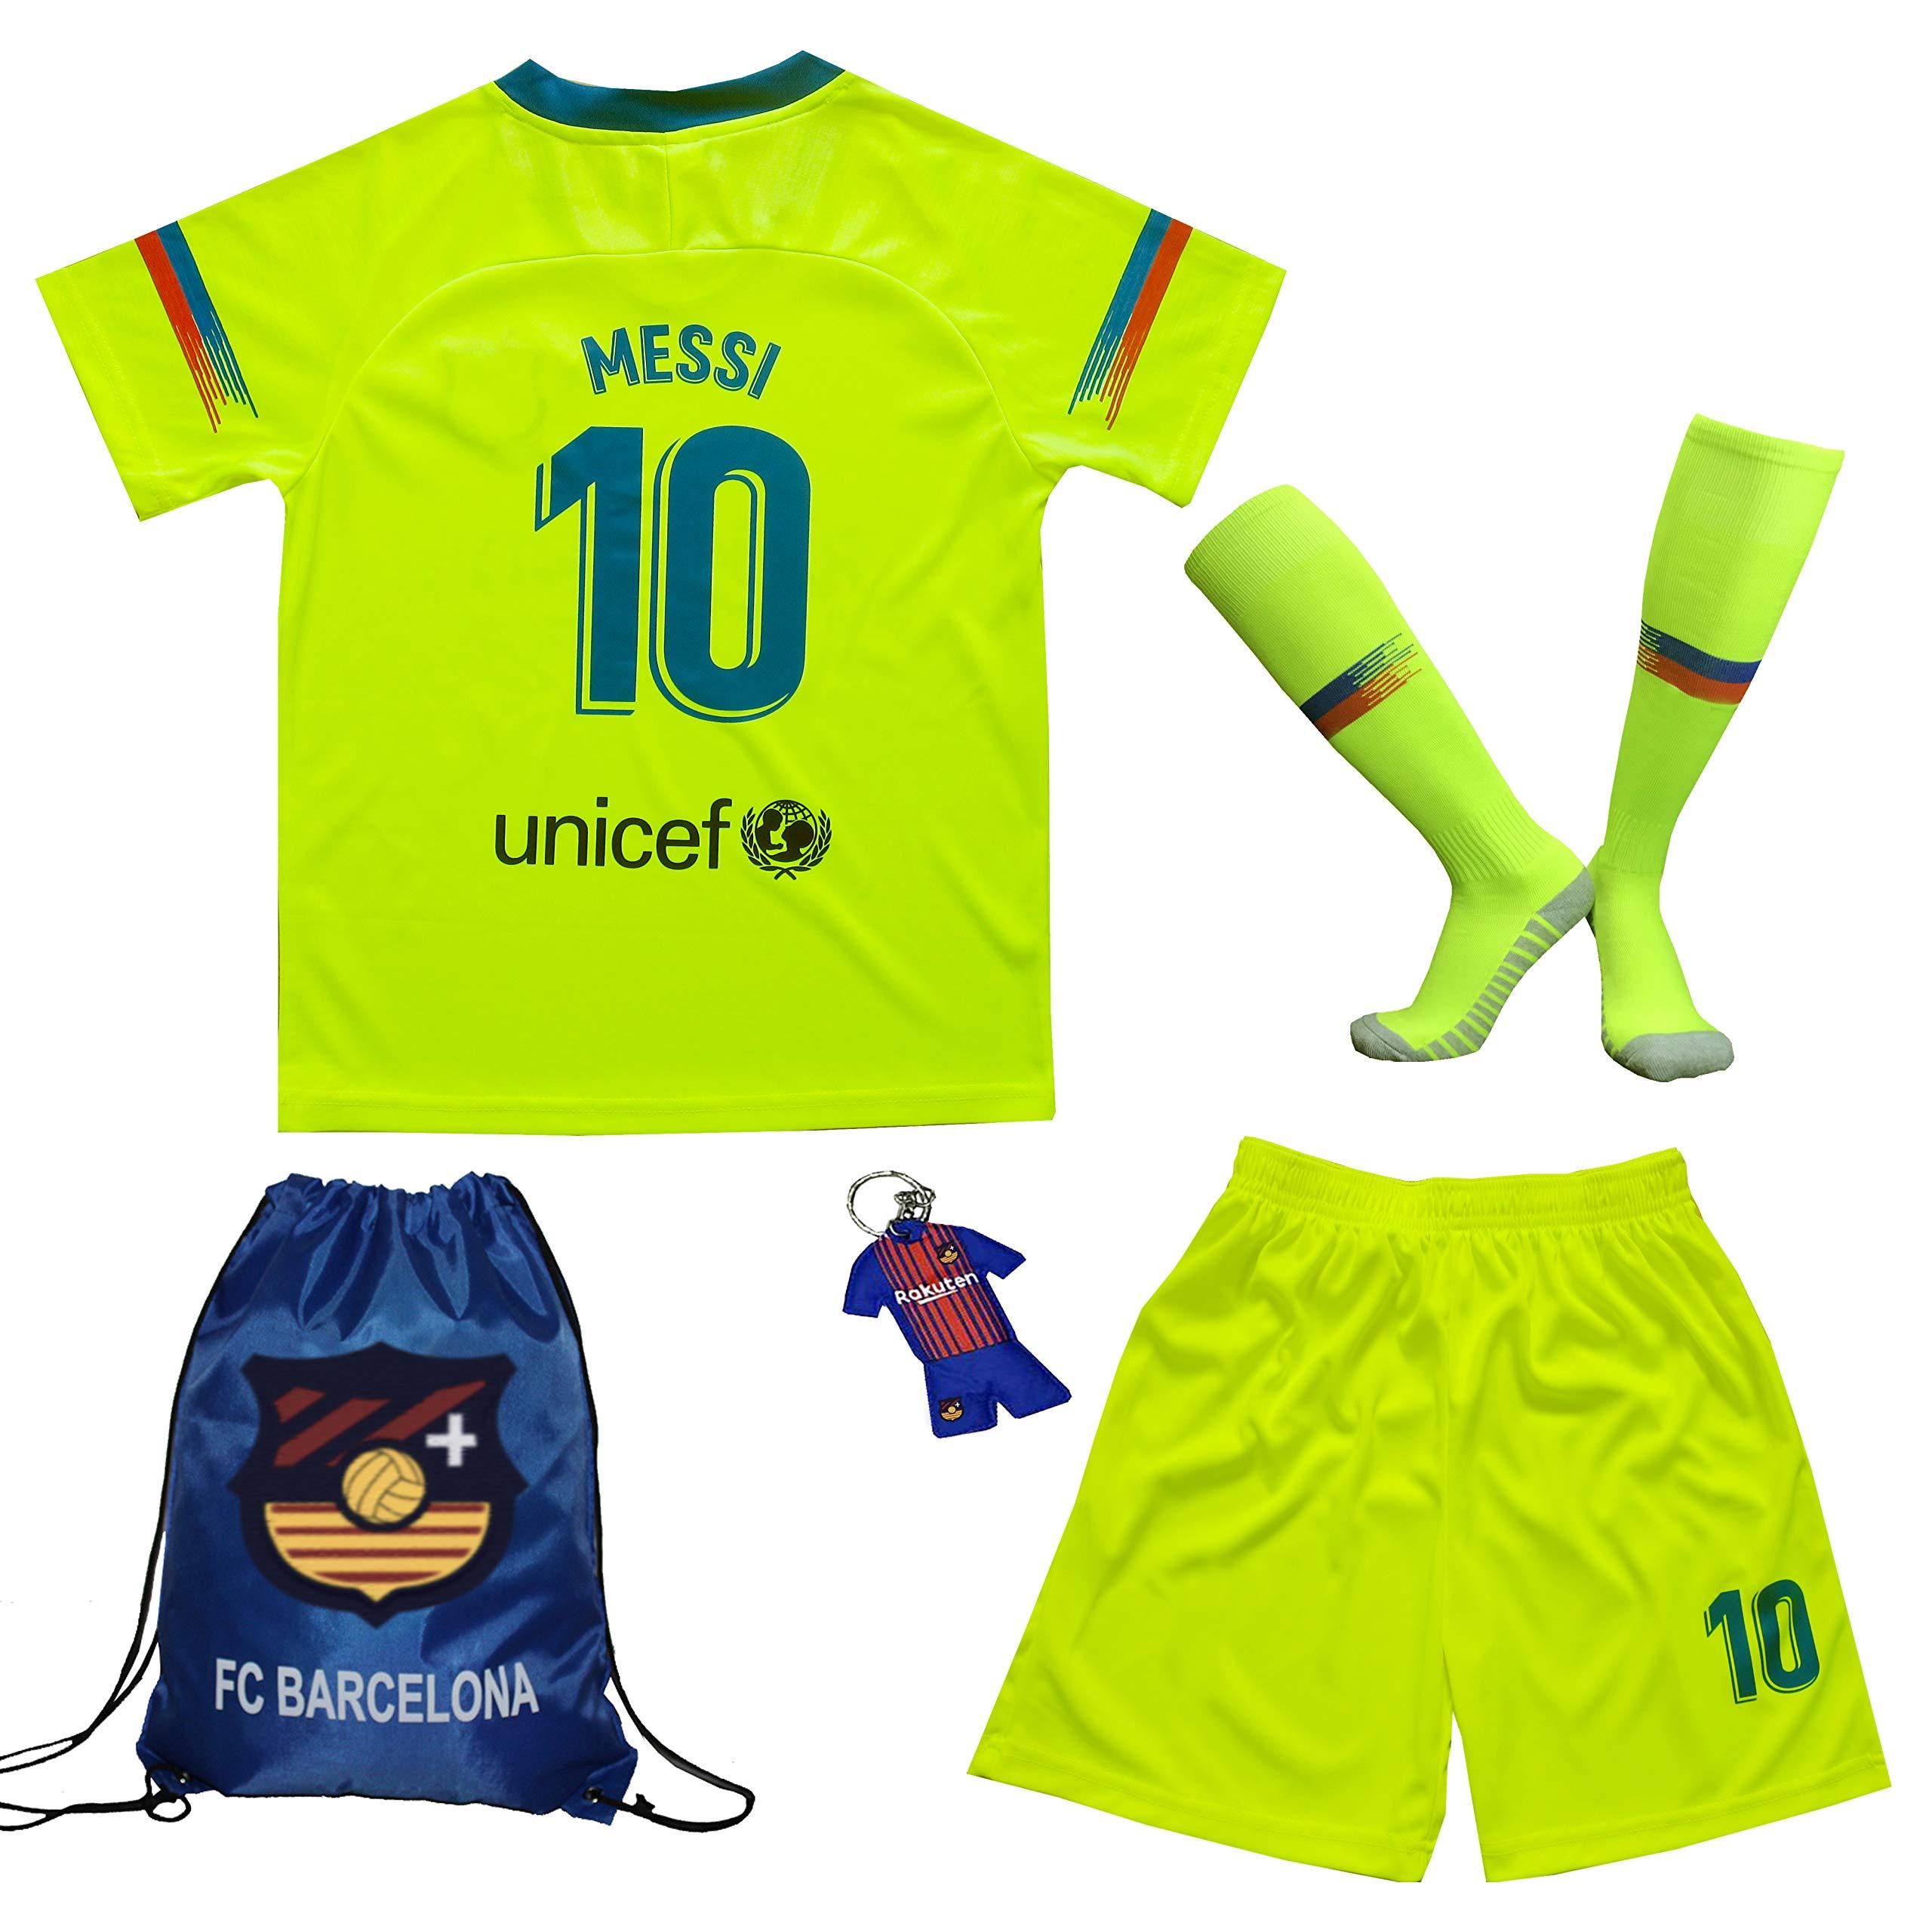 79dfe62ca2f BIRDBOX Youth Sportswear Barcelona Leo Messi 10 Kids Away Soccer Jersey  Shorts Bag Keychain Football Socks Set (3-4 Years)